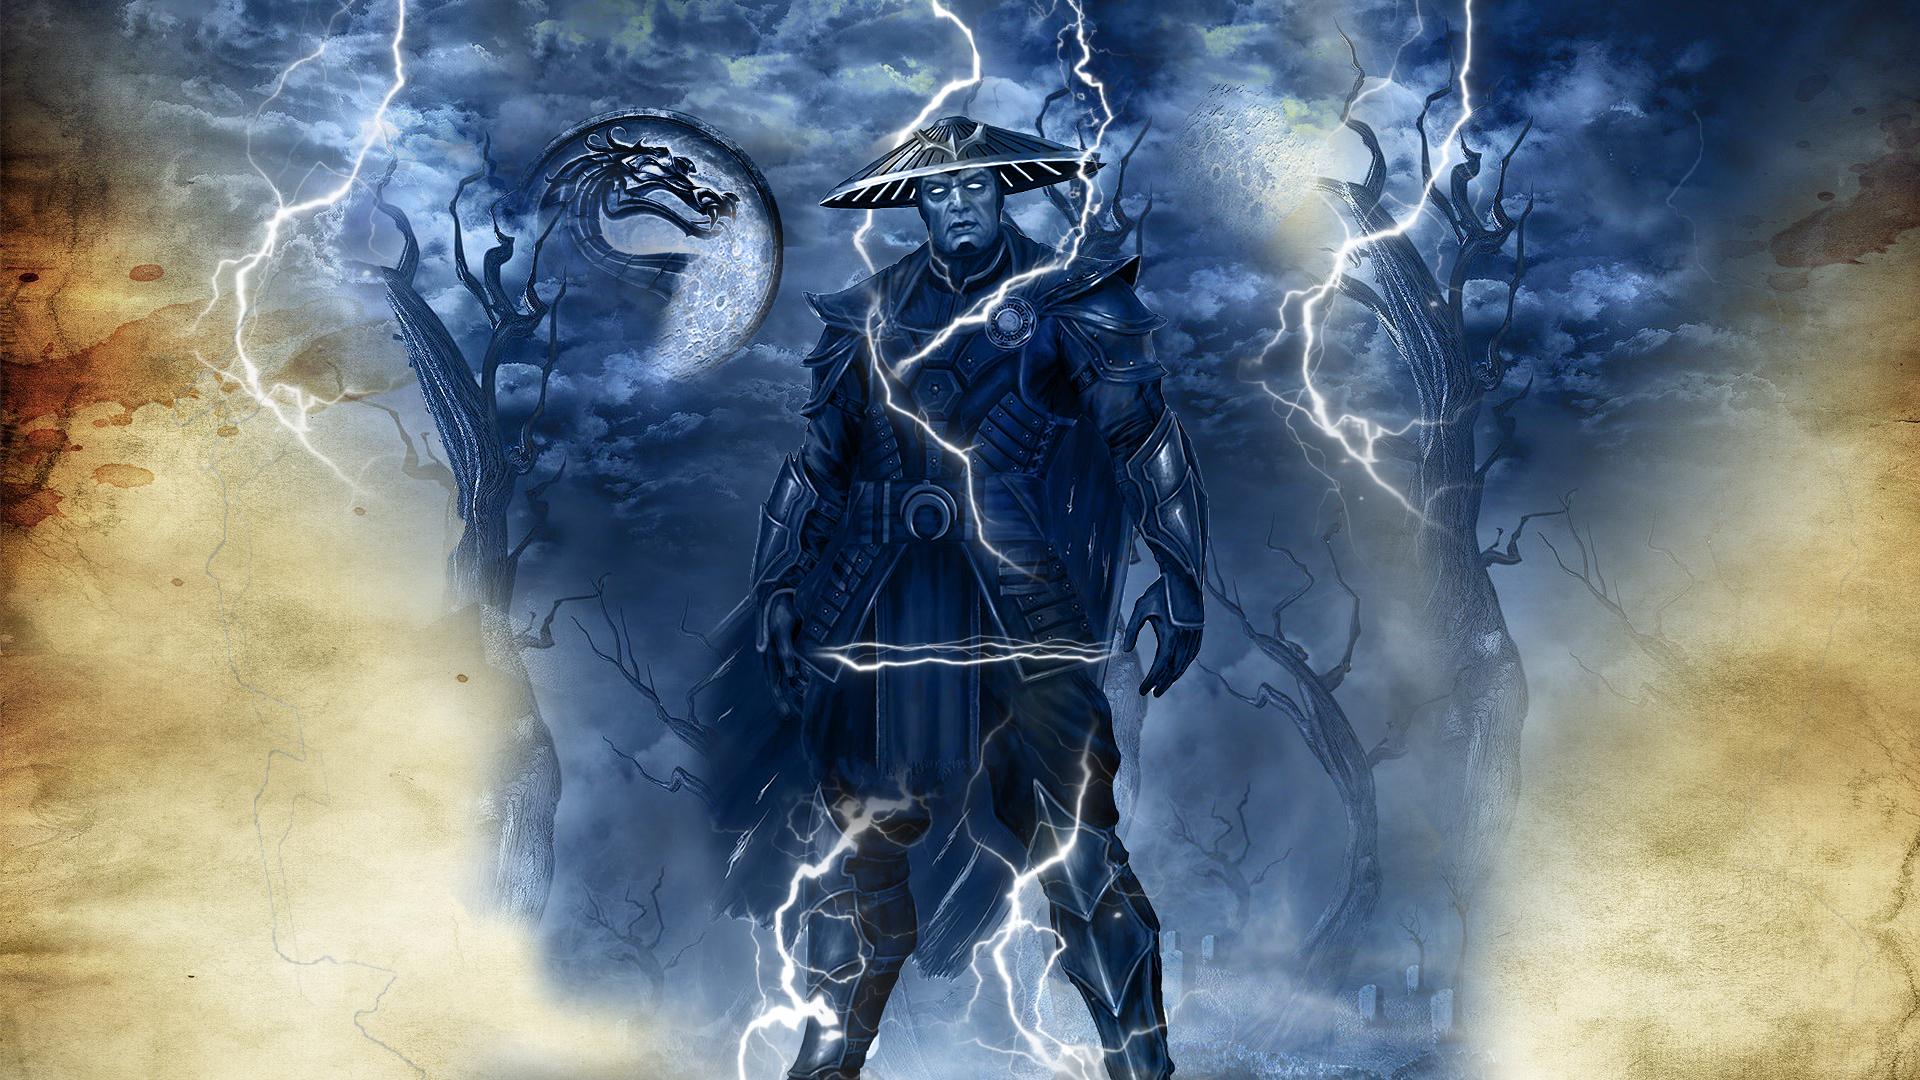 Mortal Kombat Raiden by kyveMortal Kombat 10 Raiden